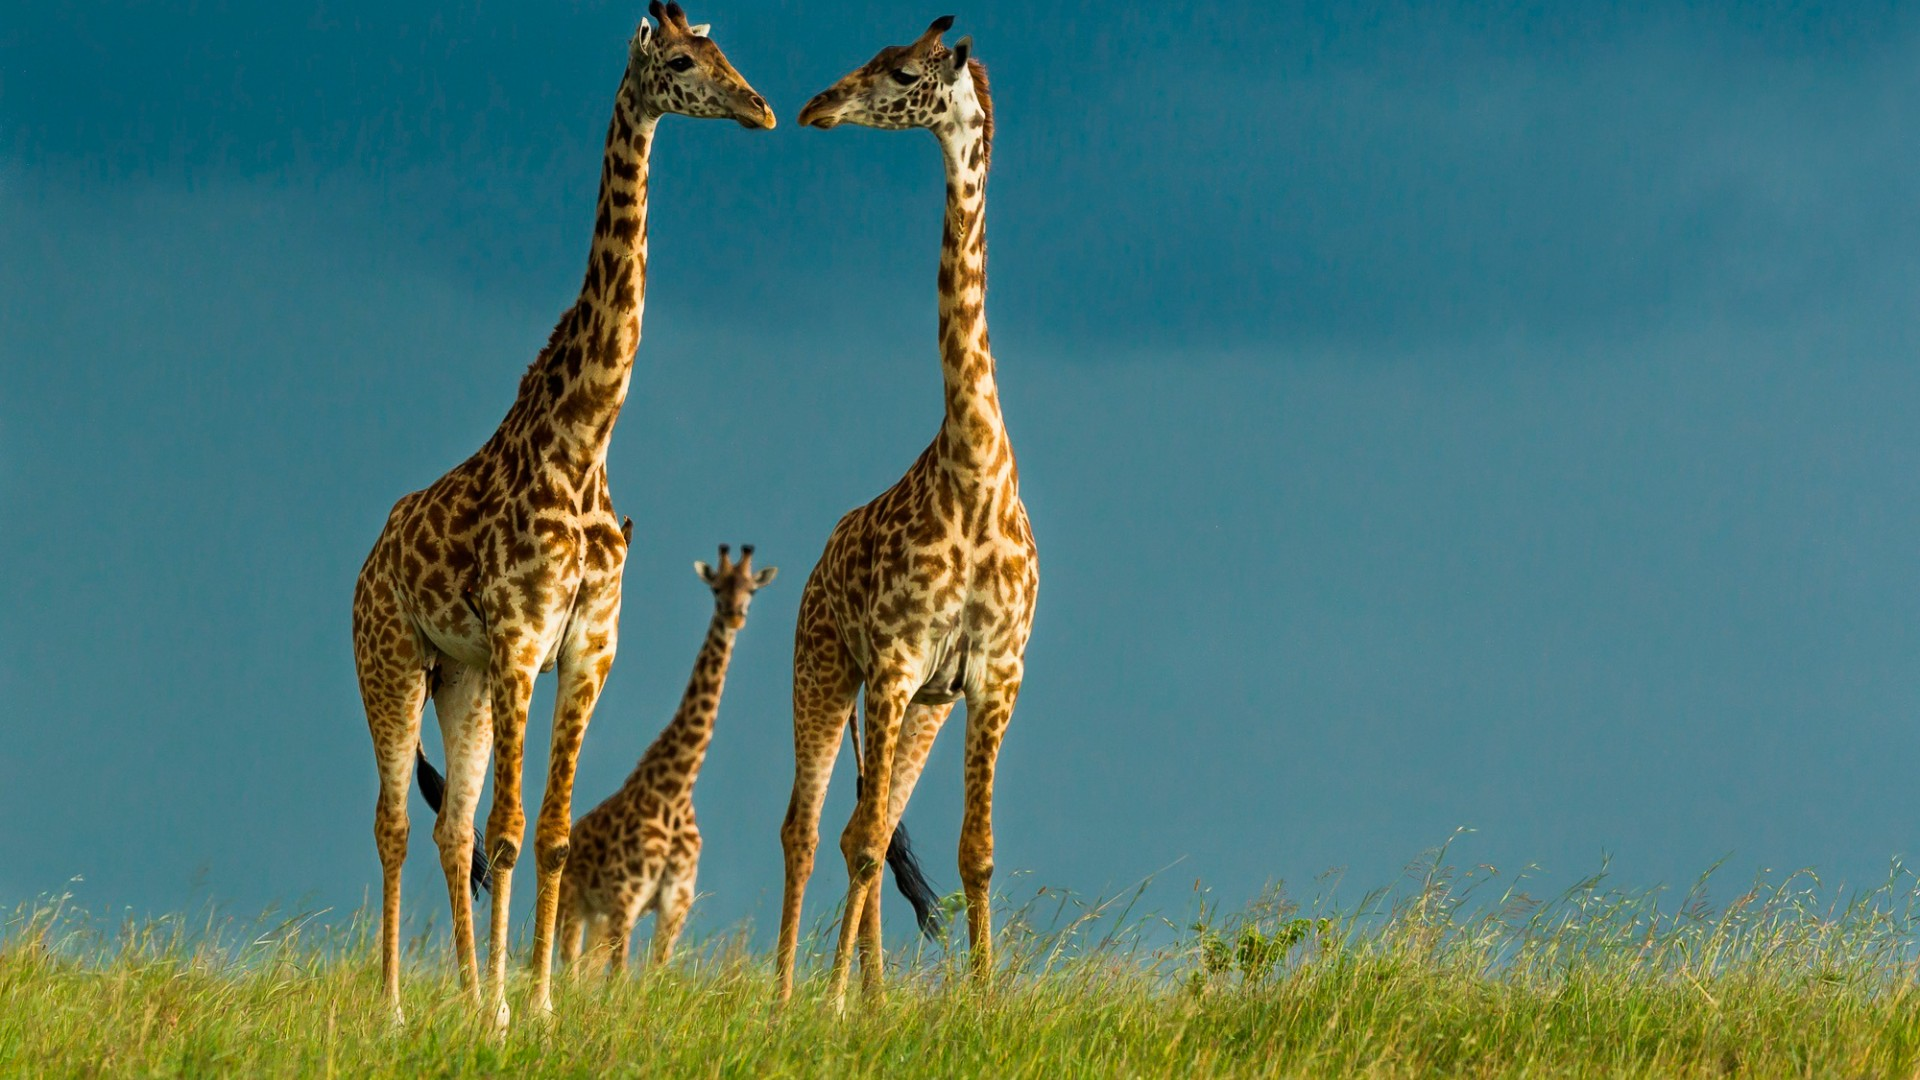 Giraffe Wallpaper Download Hd Wallpapers